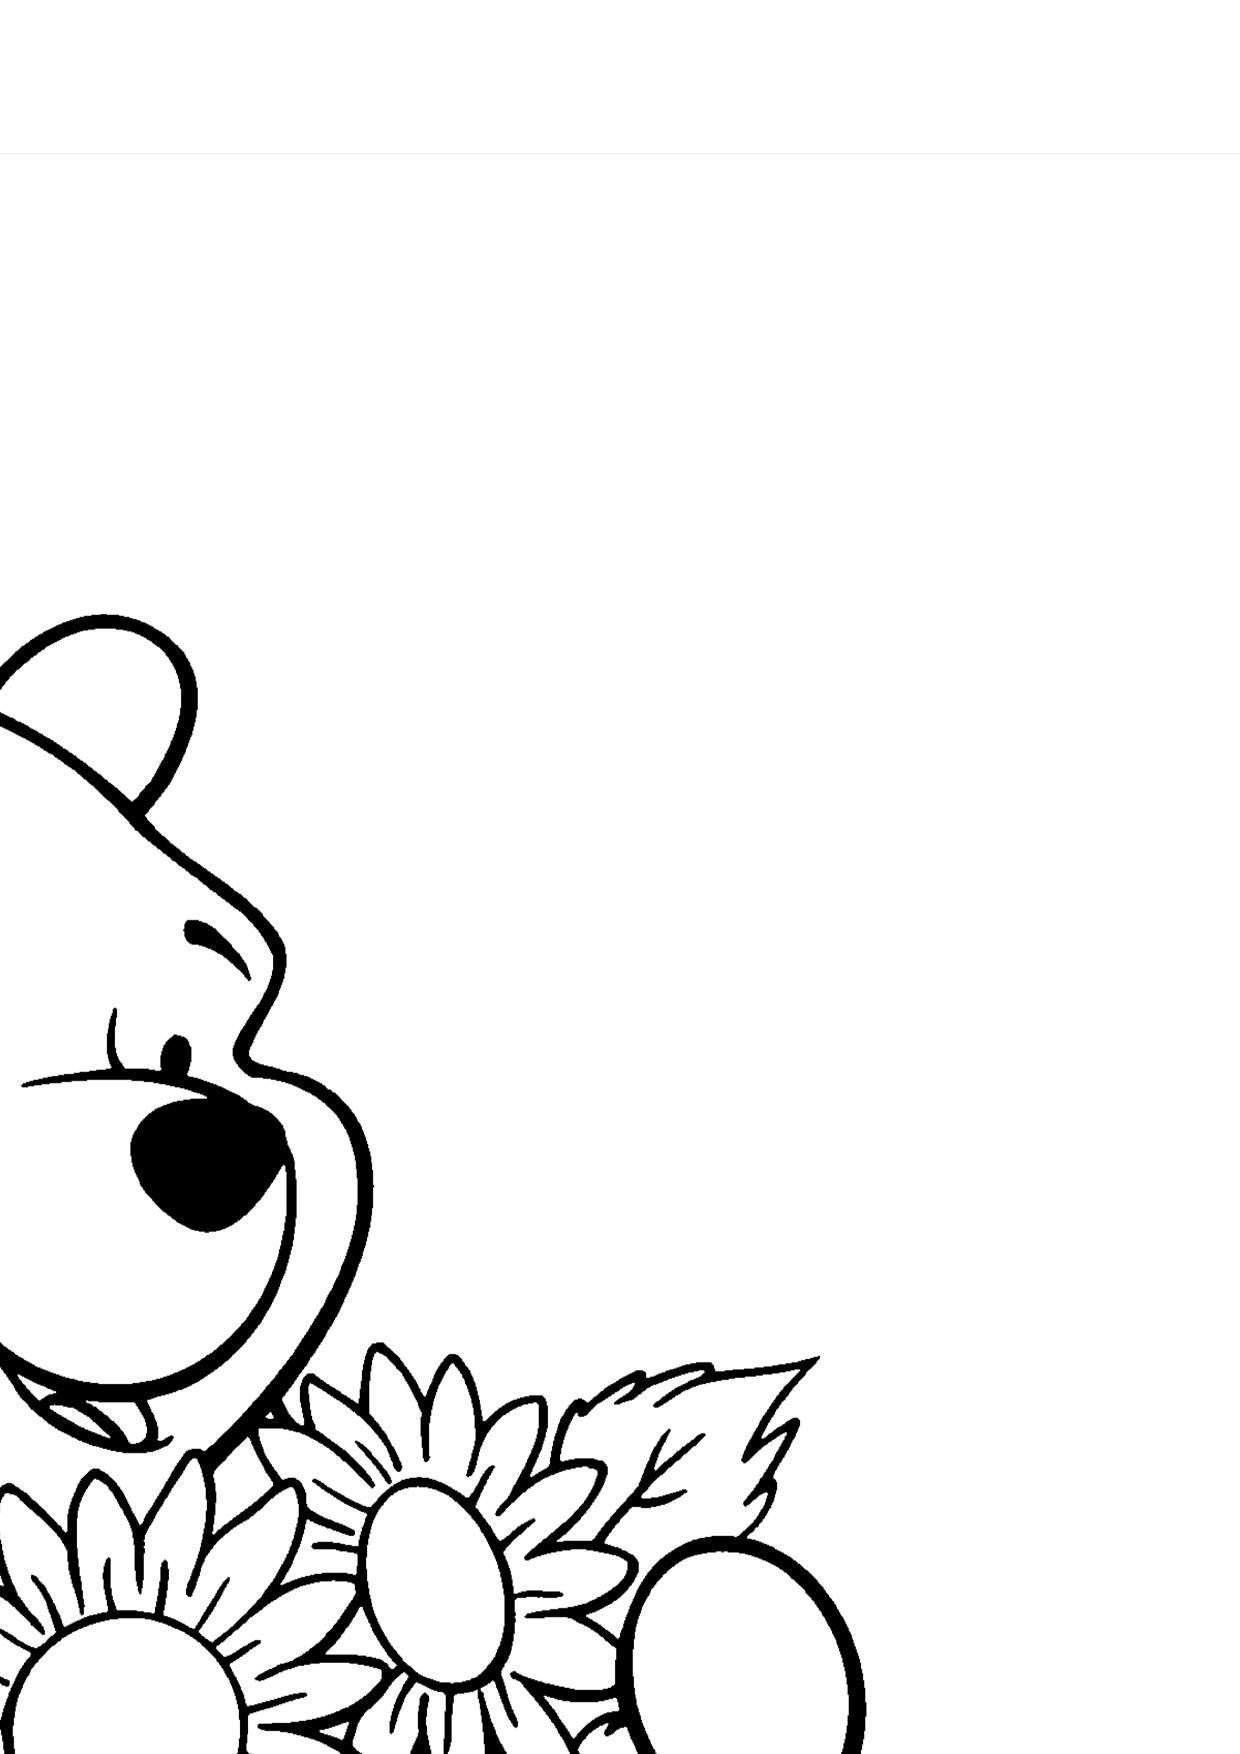 Kolorowanki Xxl Kubus Puchatek Dzien Kubusia Puchatka Kolorowanki Xxl Cute Backgrounds Cute Snoopy